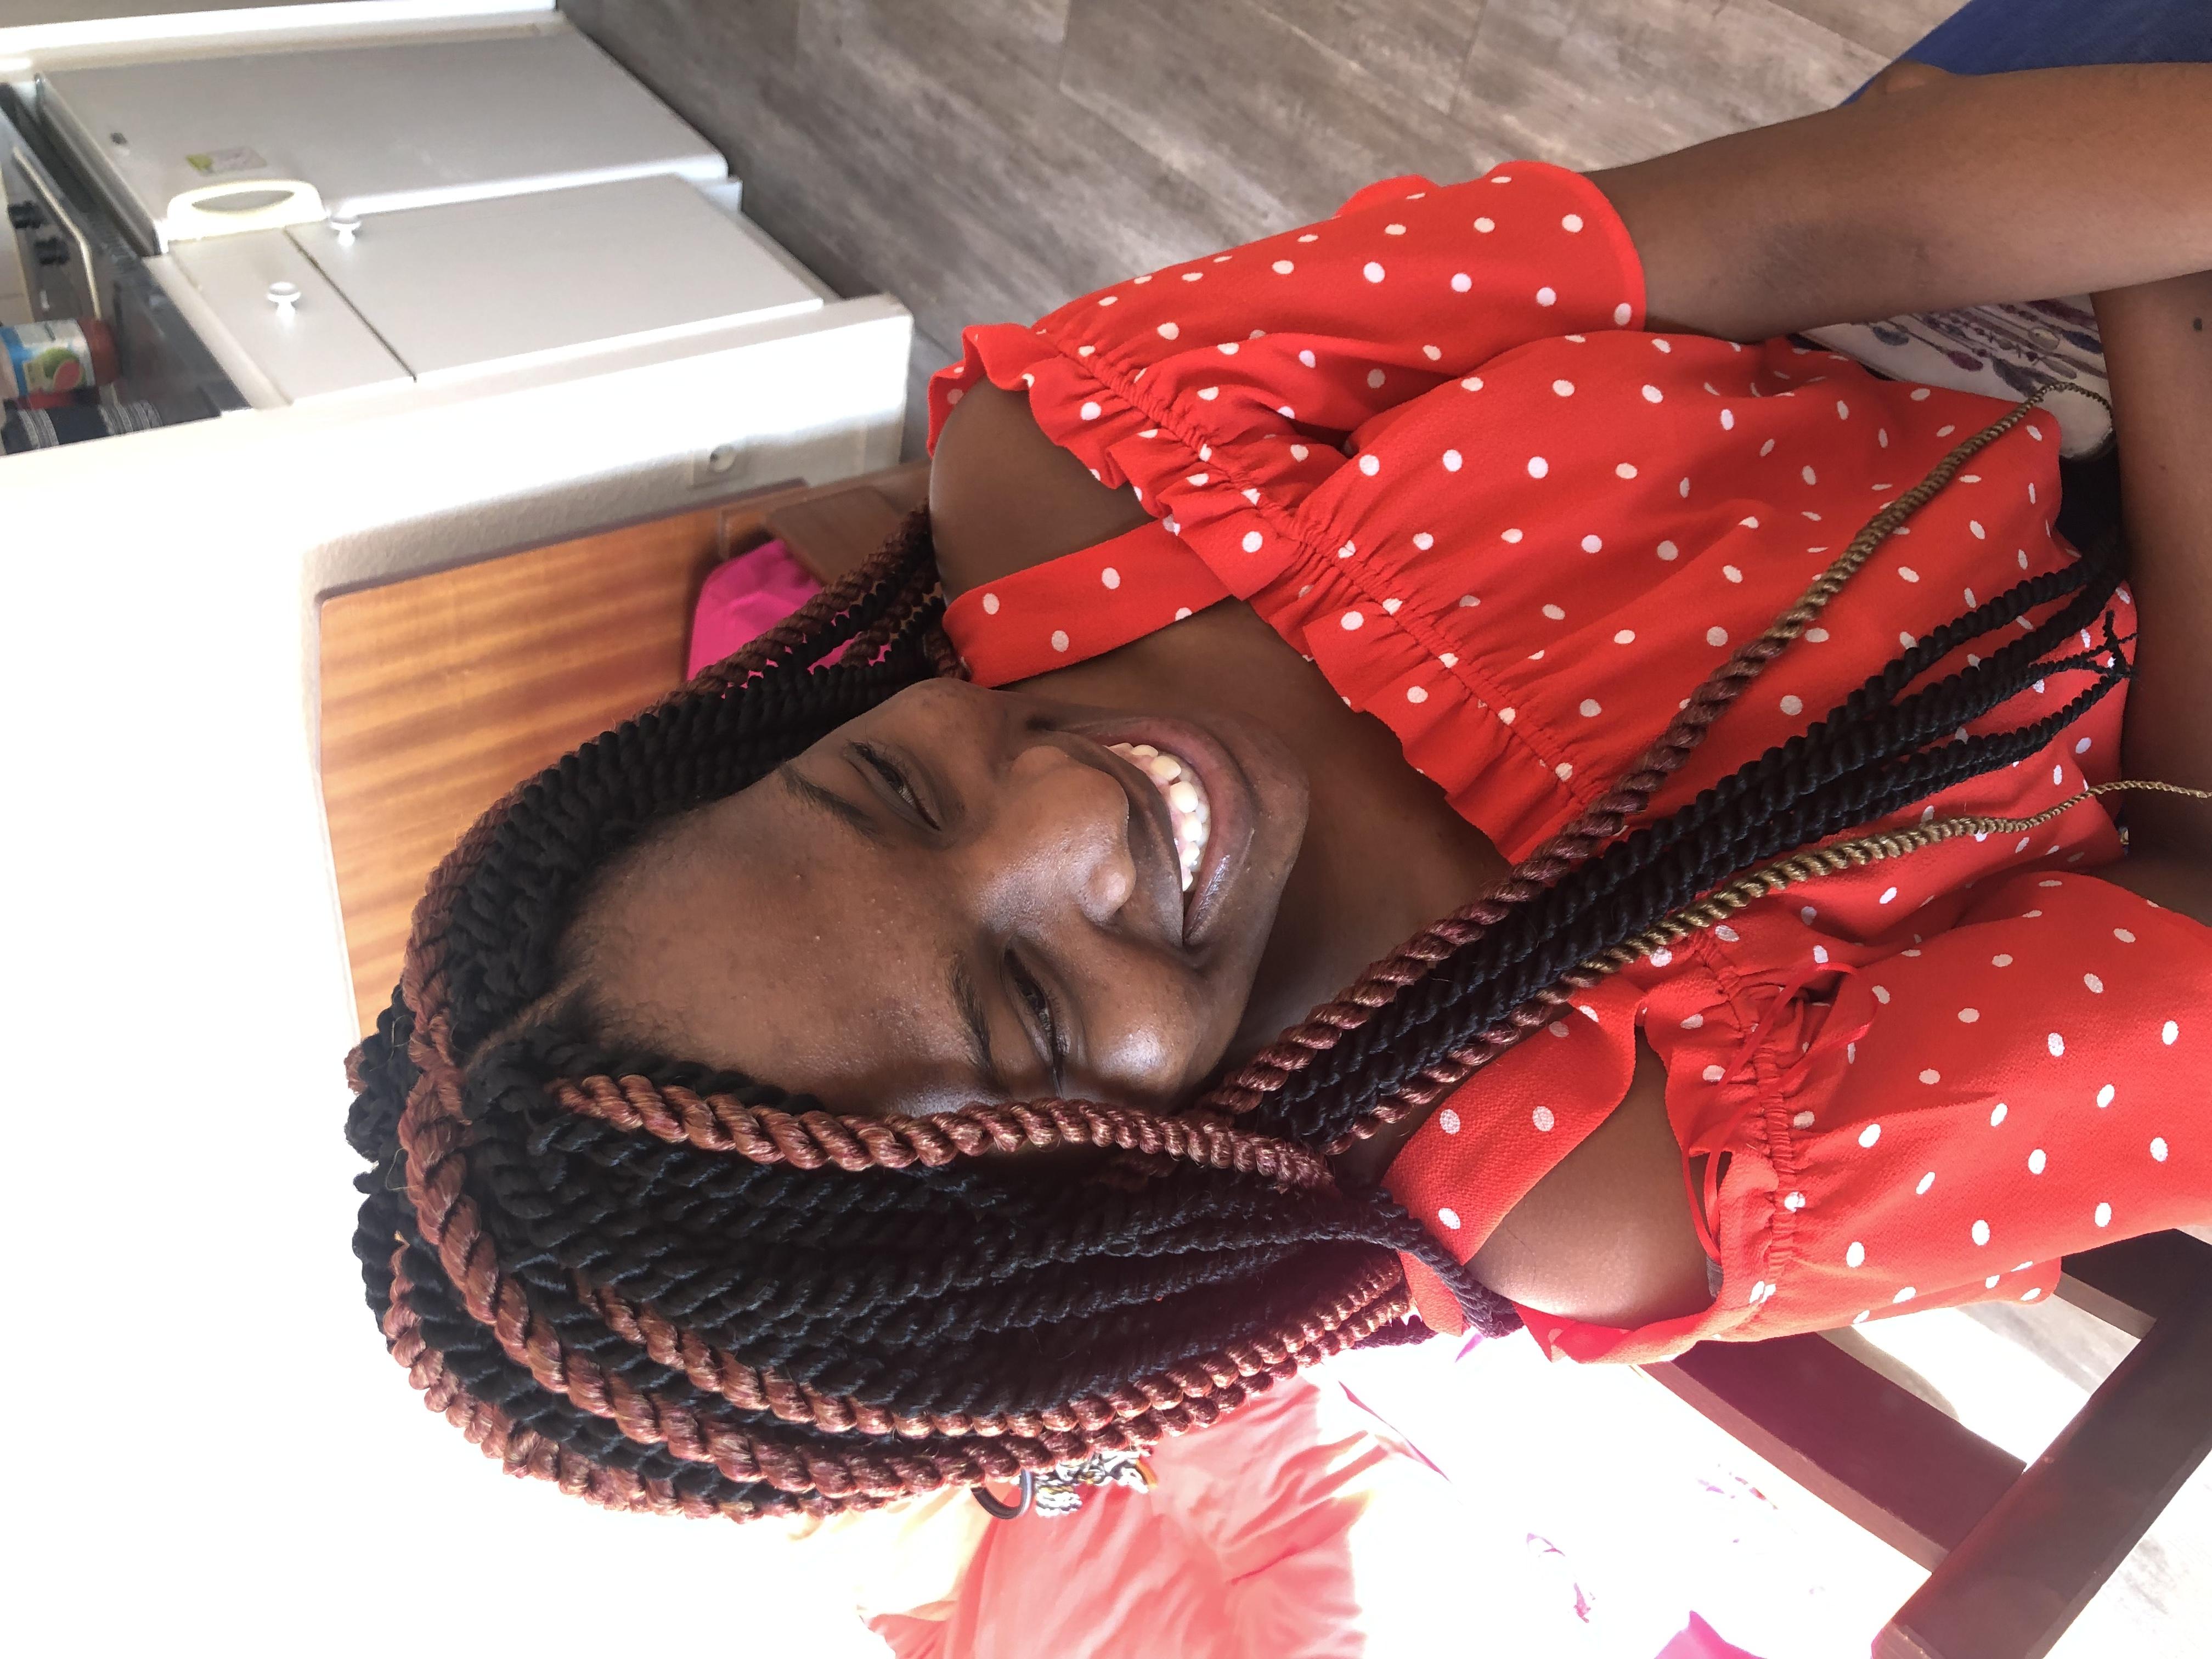 salon de coiffure afro tresse tresses box braids crochet braids vanilles tissages paris 75 77 78 91 92 93 94 95 EEGEORVU